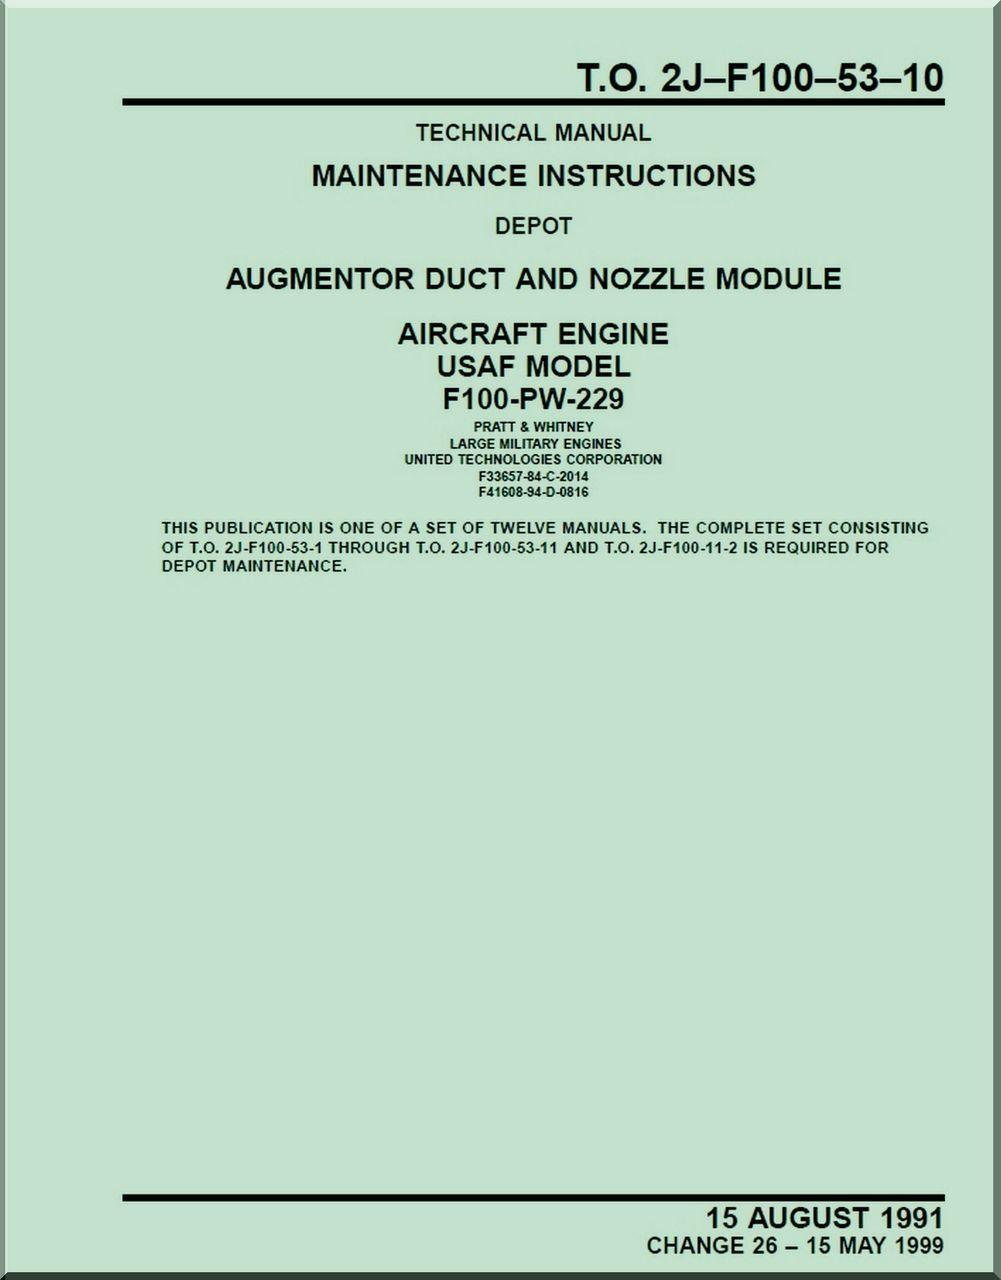 pratt whitney f 100 pw 229 aircraft engines maintenance rh pinterest com F100 Aircraft Engine American Vietnam Era Jet Aircraft